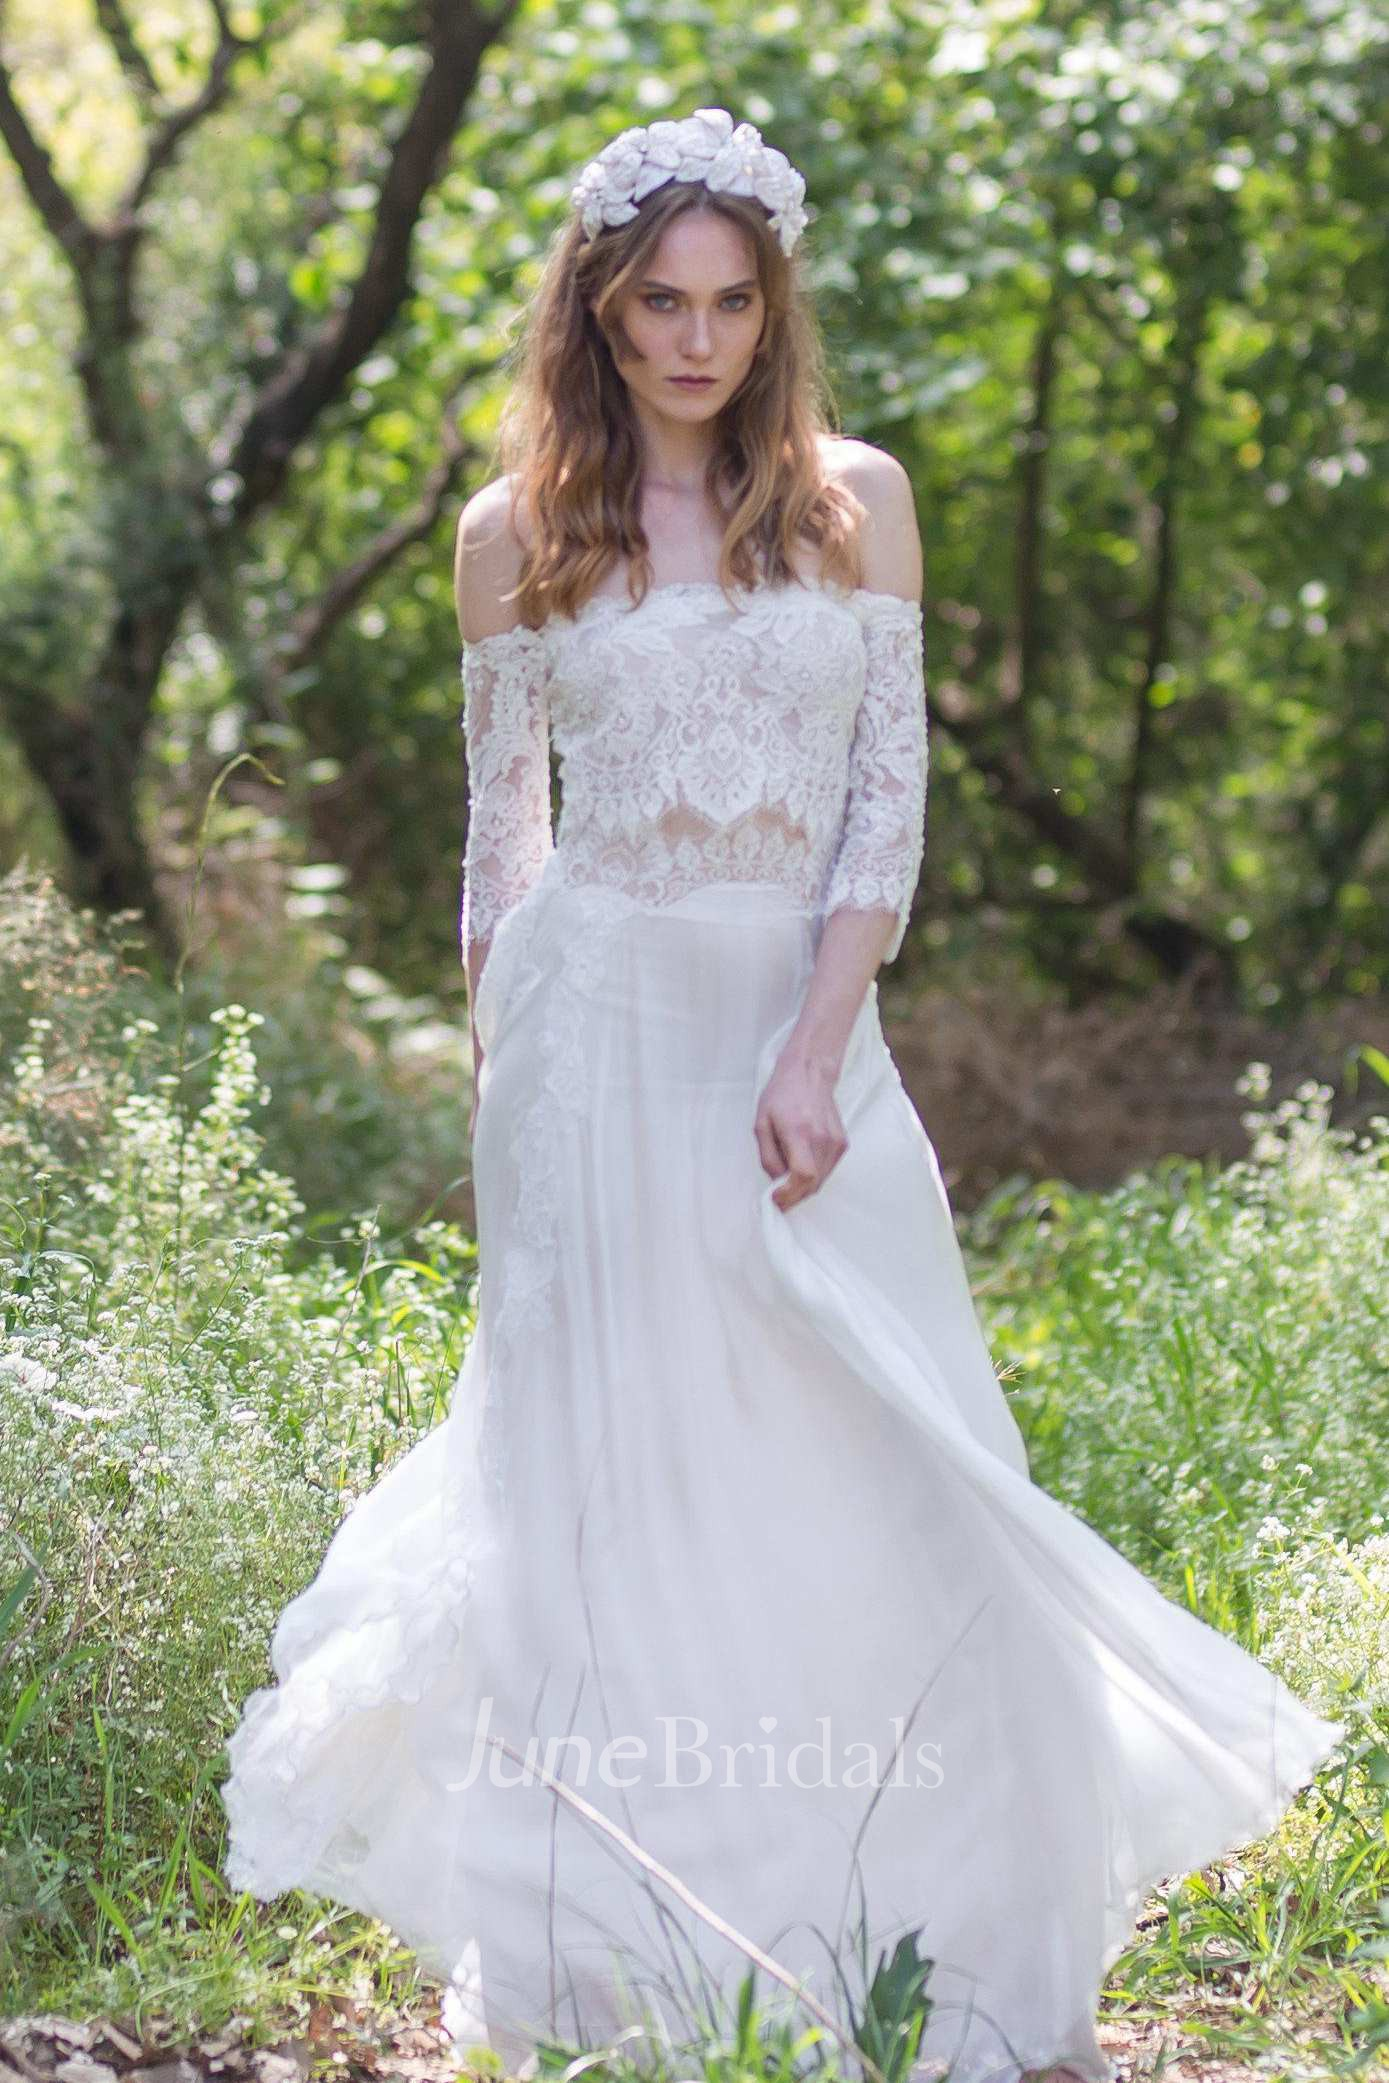 Offtheshoulder Lace Chiffon Boho Wedding Dress With Corset Back  June Bridals